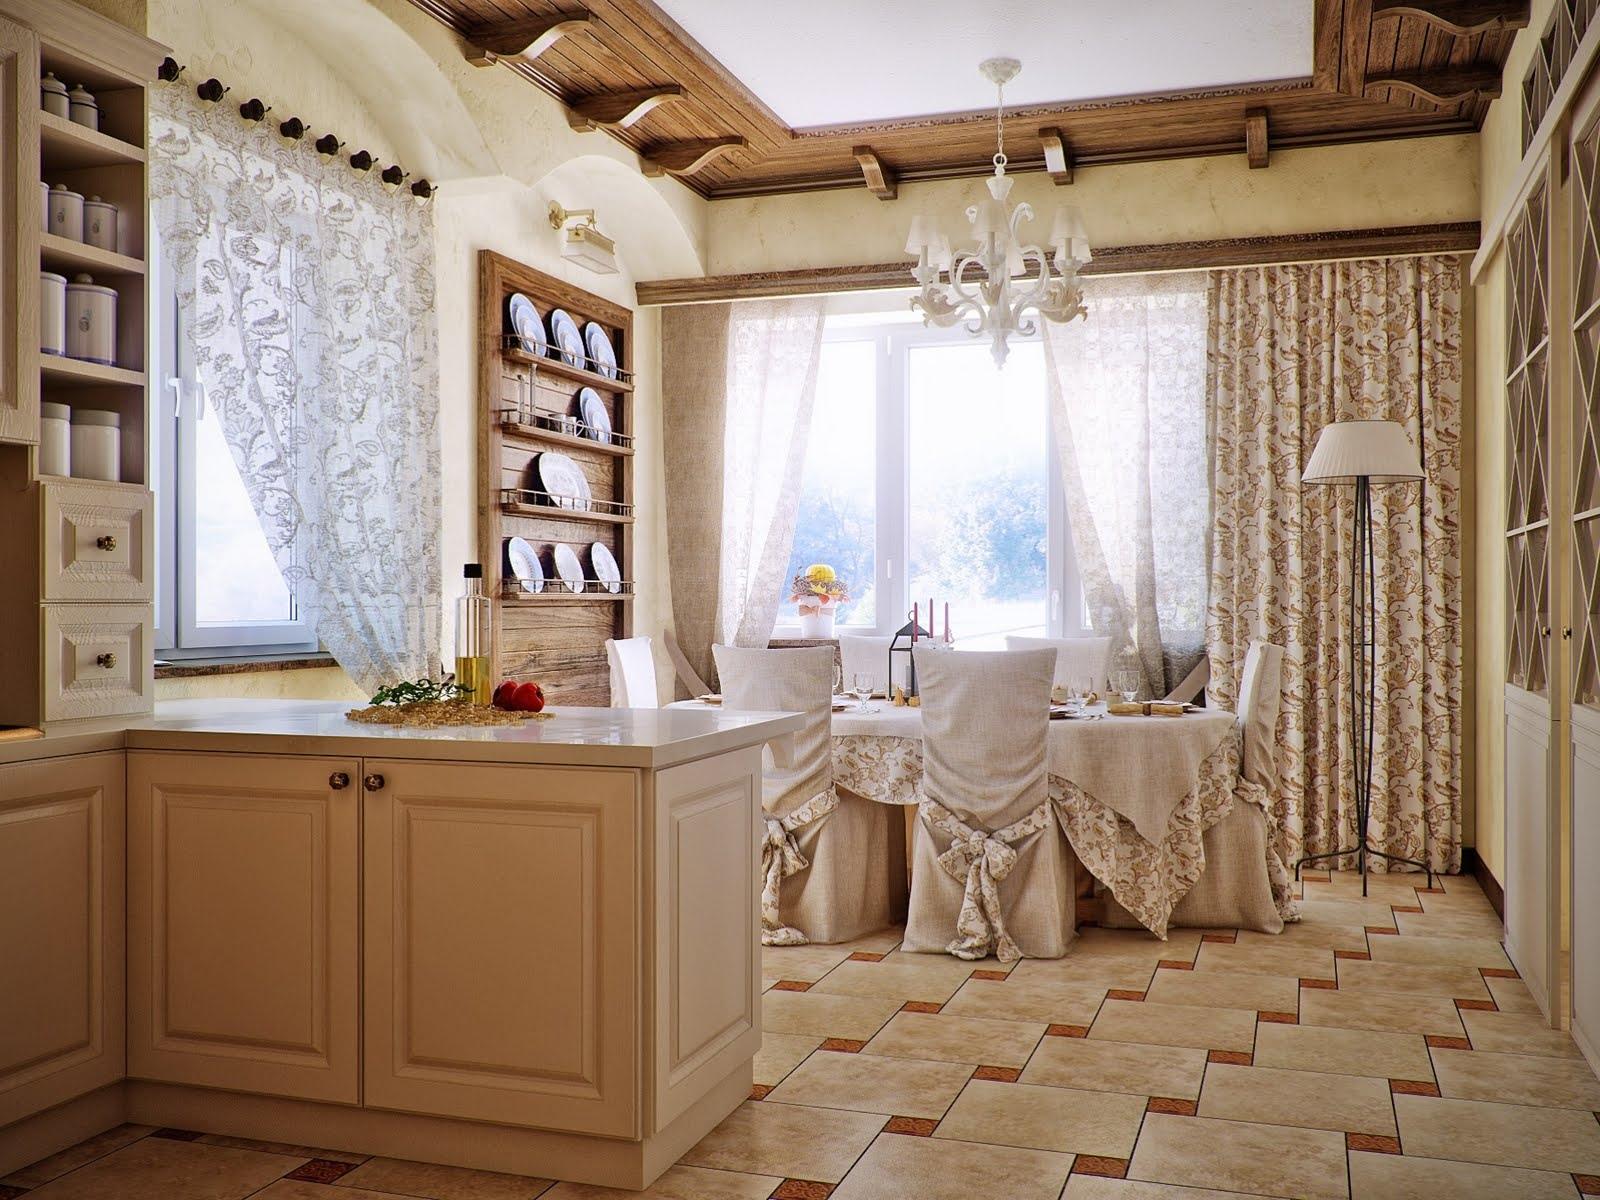 kitchen-and-dining-room-ideas-GvJr - Design On Vine